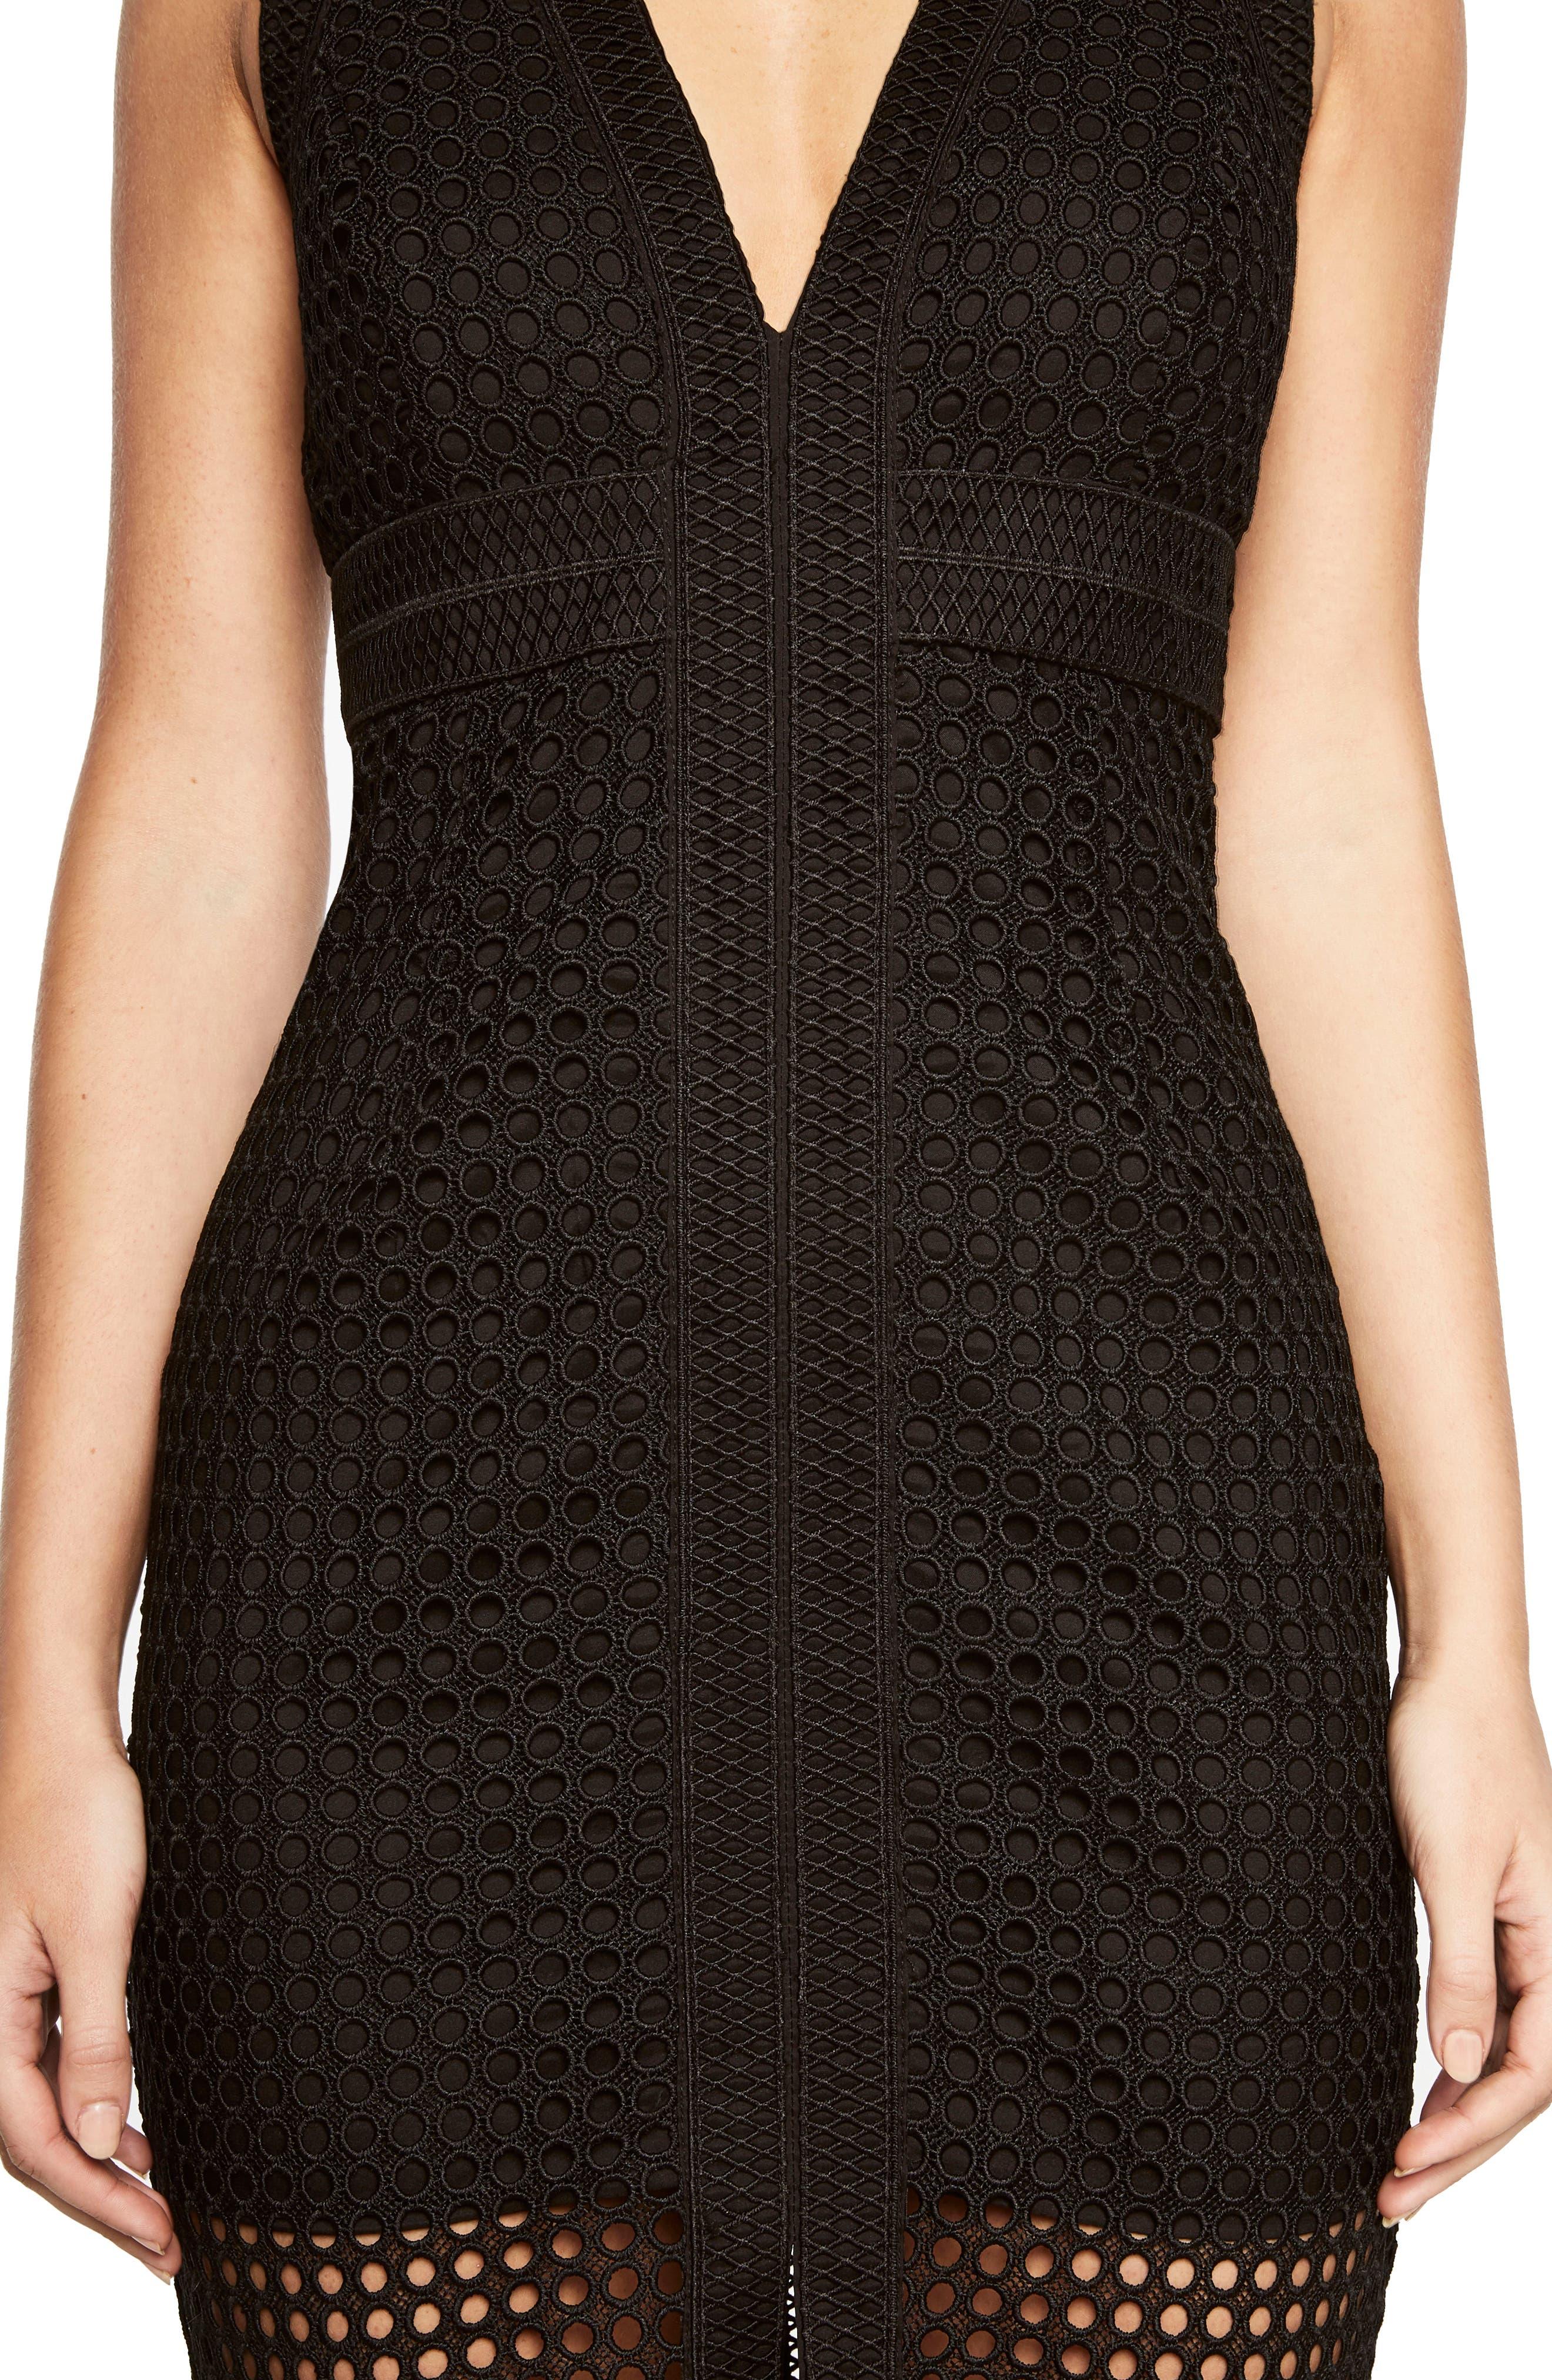 Layered Crochet Sheath Dress,                             Alternate thumbnail 4, color,                             001